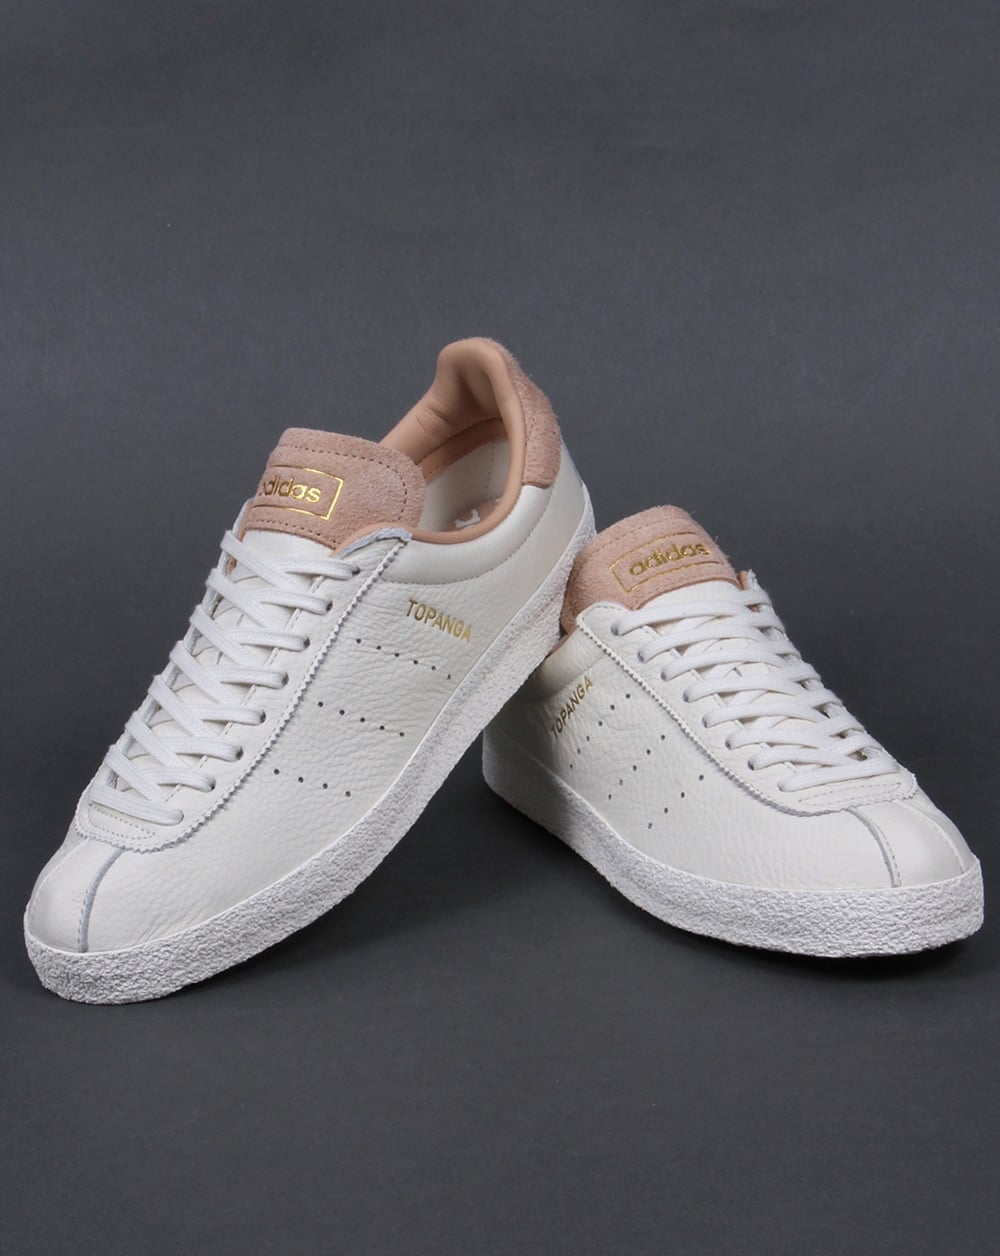 Adidas Topanga Trainers Off White, Originals, Clean